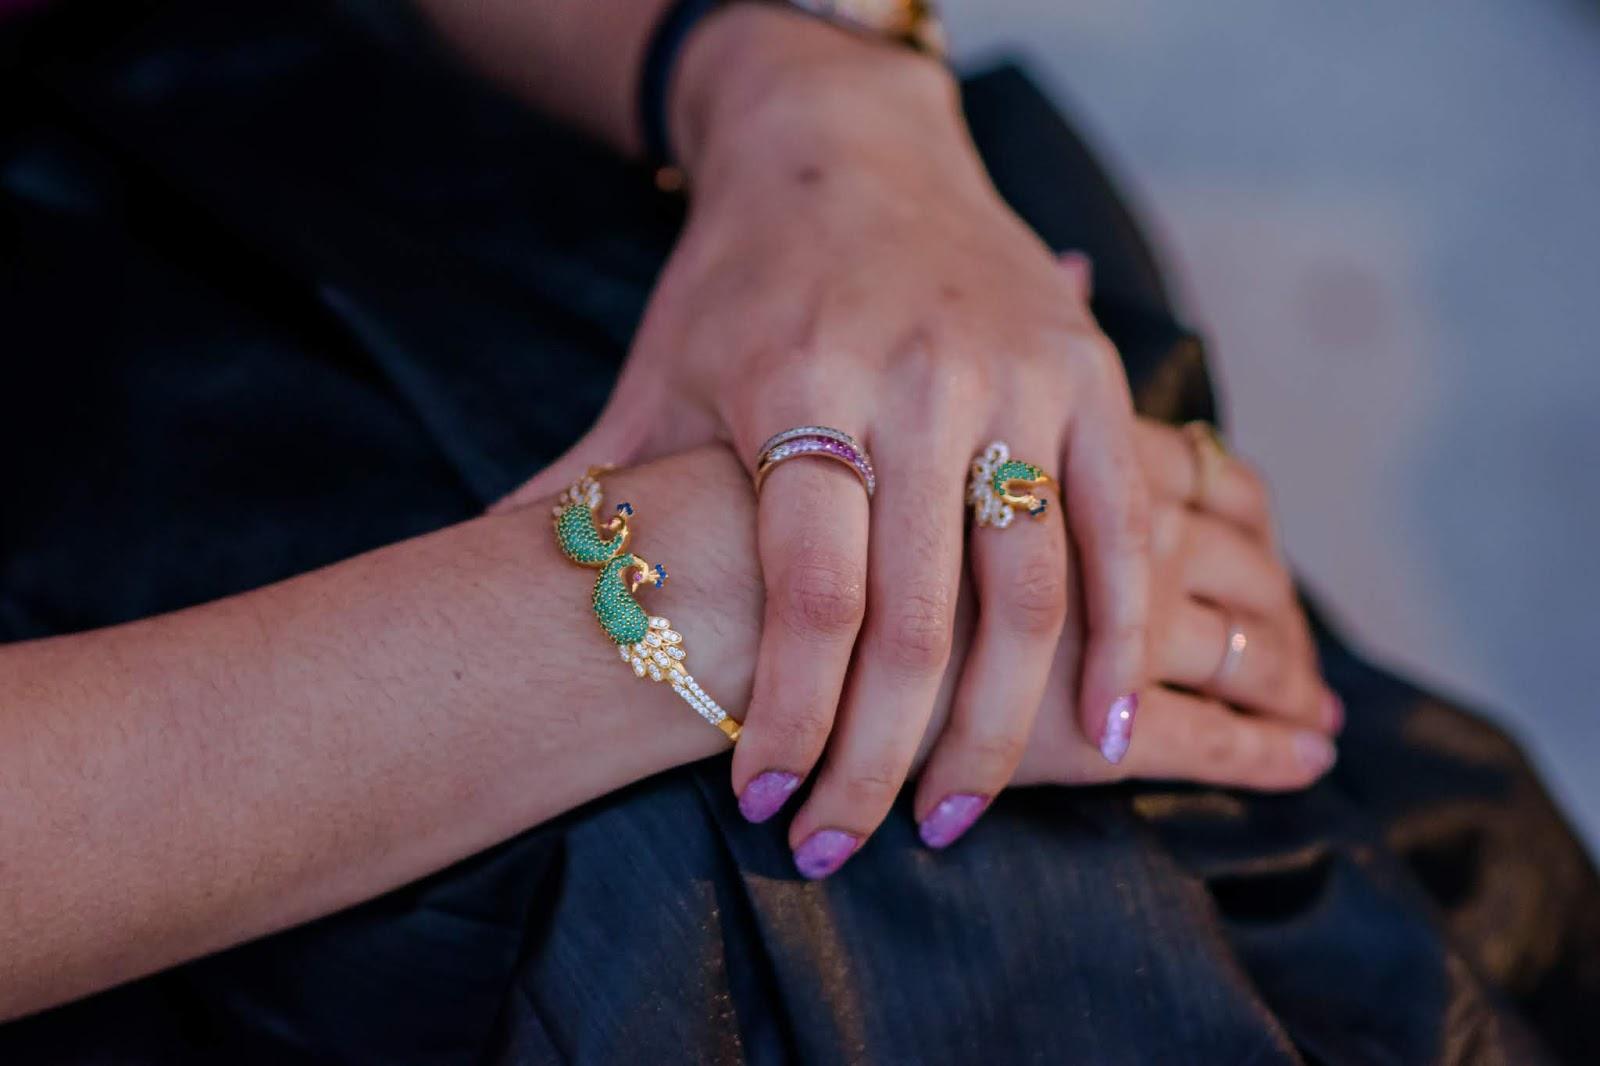 My Eternal Love for Saree - Diwali 2018; Aim for Glam; Indian Jewelry;Prasanthi Kadiyala;Saree Love; Diwali; Indian Fashion blogger; South Indian Fashion blogger; South Indian; Saree Lover;